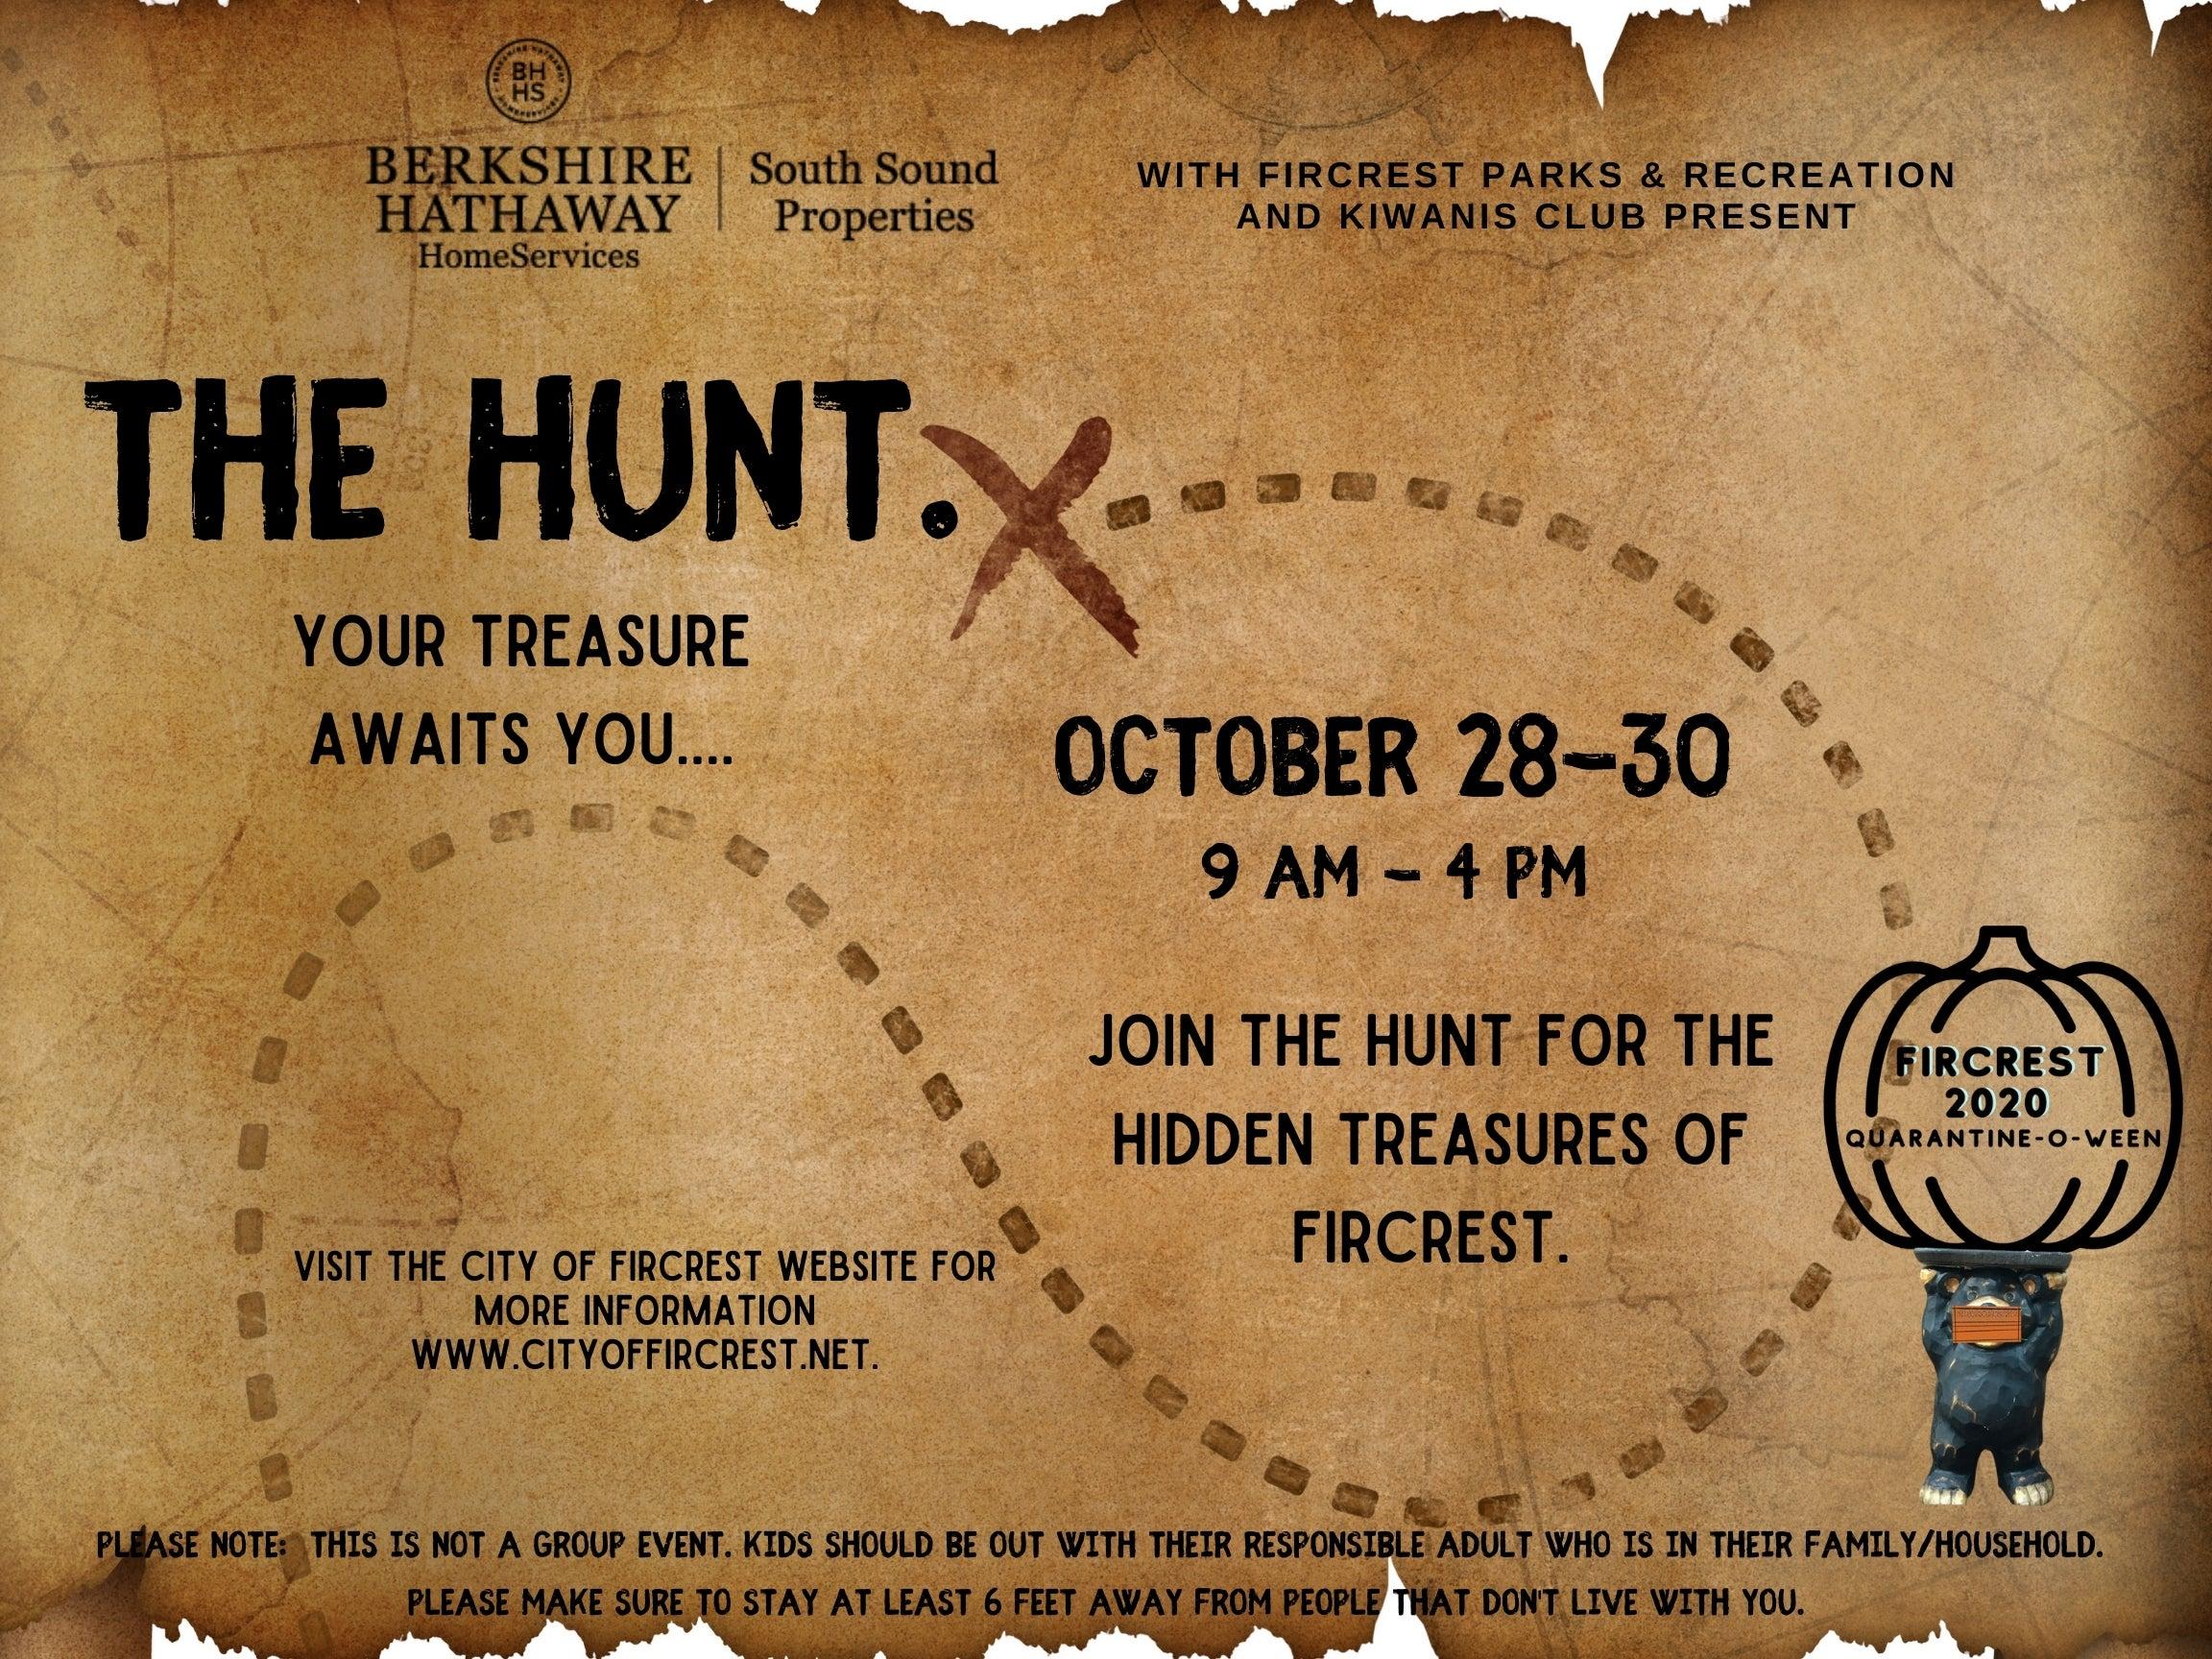 treasure hunt poster city of fircrest